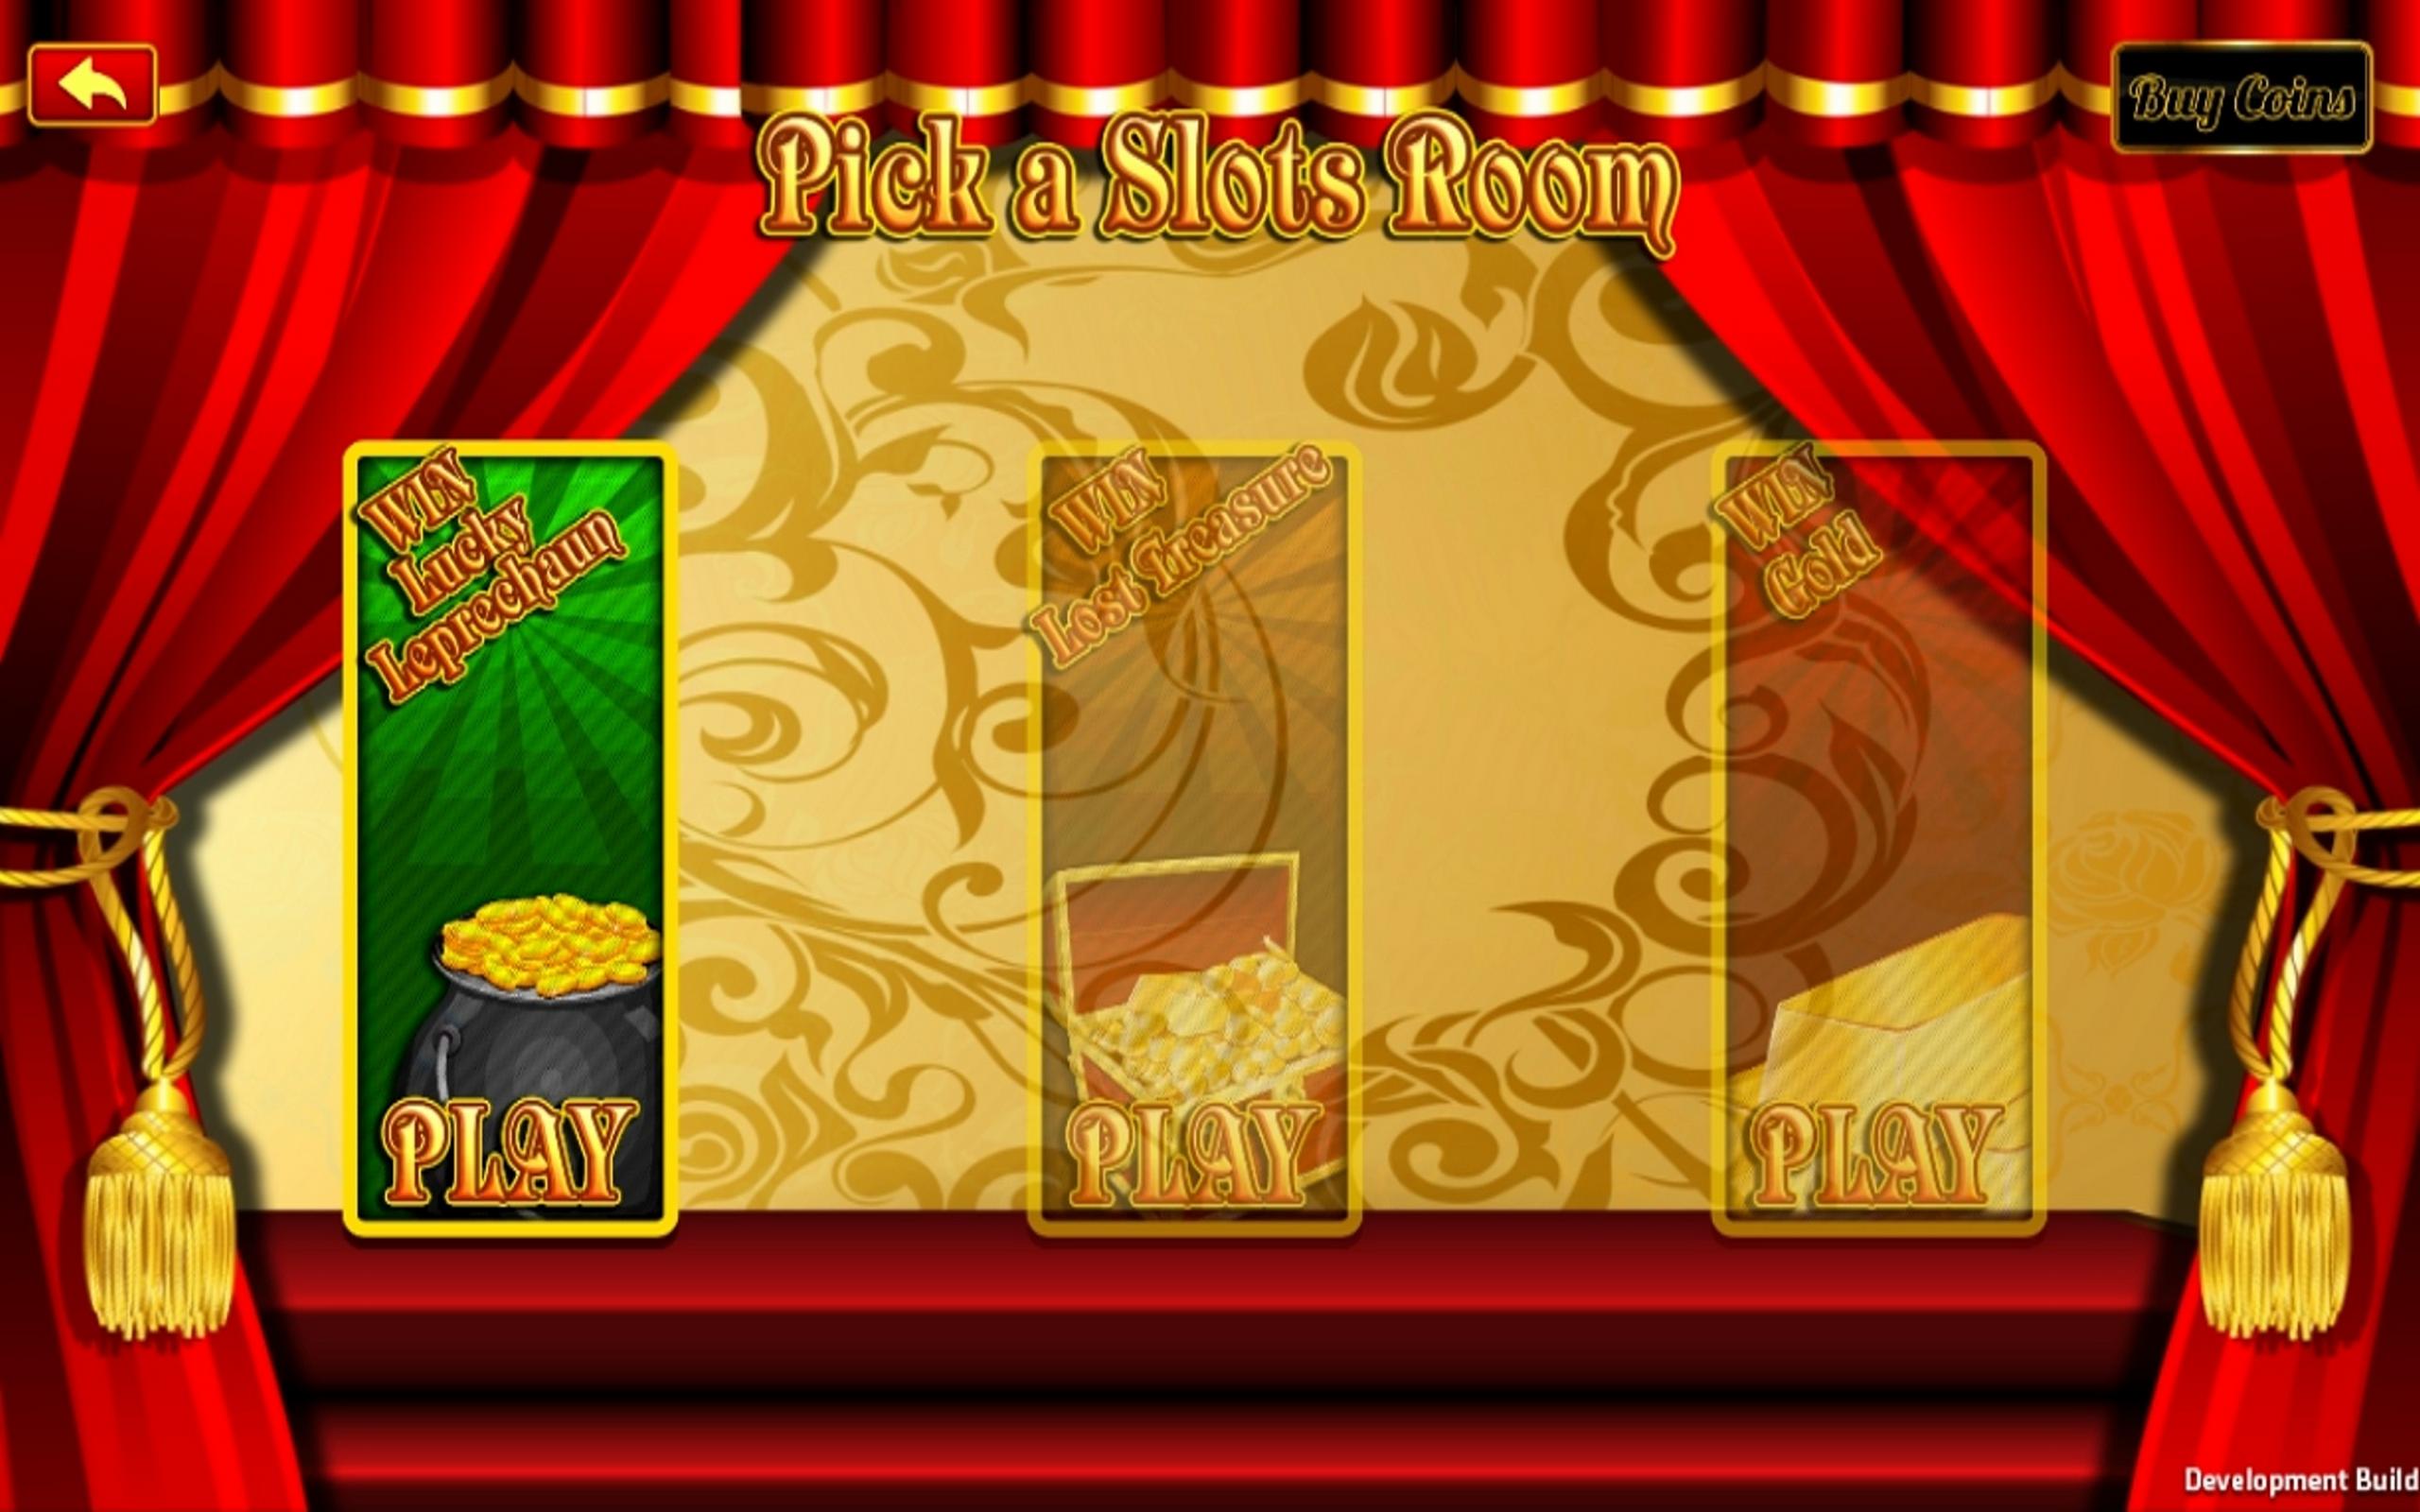 Golden nugget casino new orleans